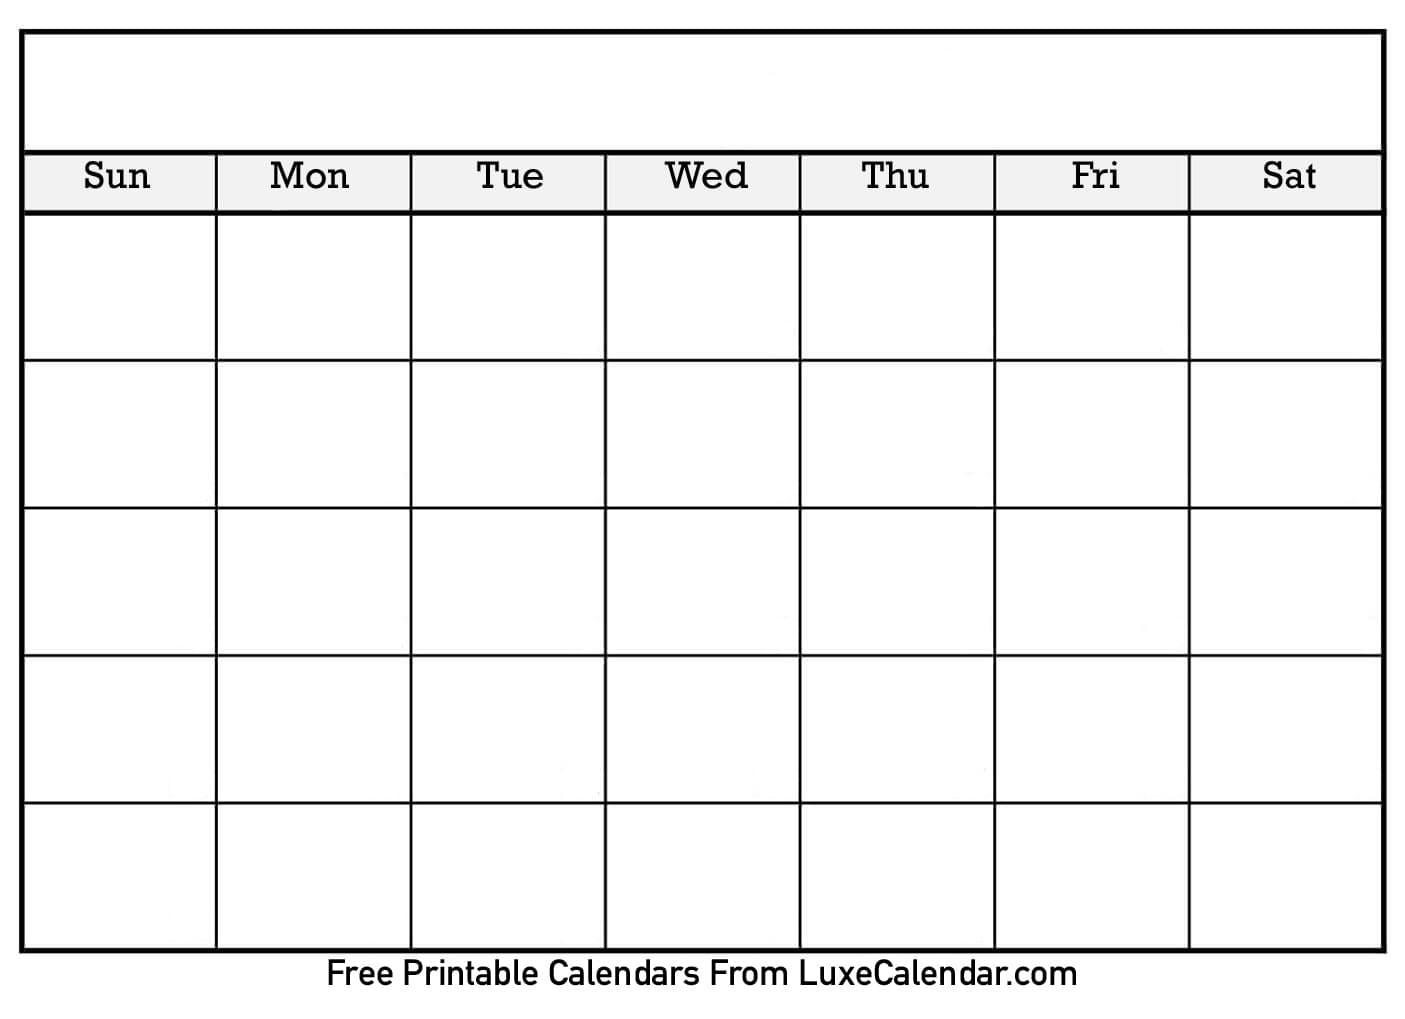 Blank Printable Calendar - Luxe Calendar with Printable Editable Monthly Calendar Template